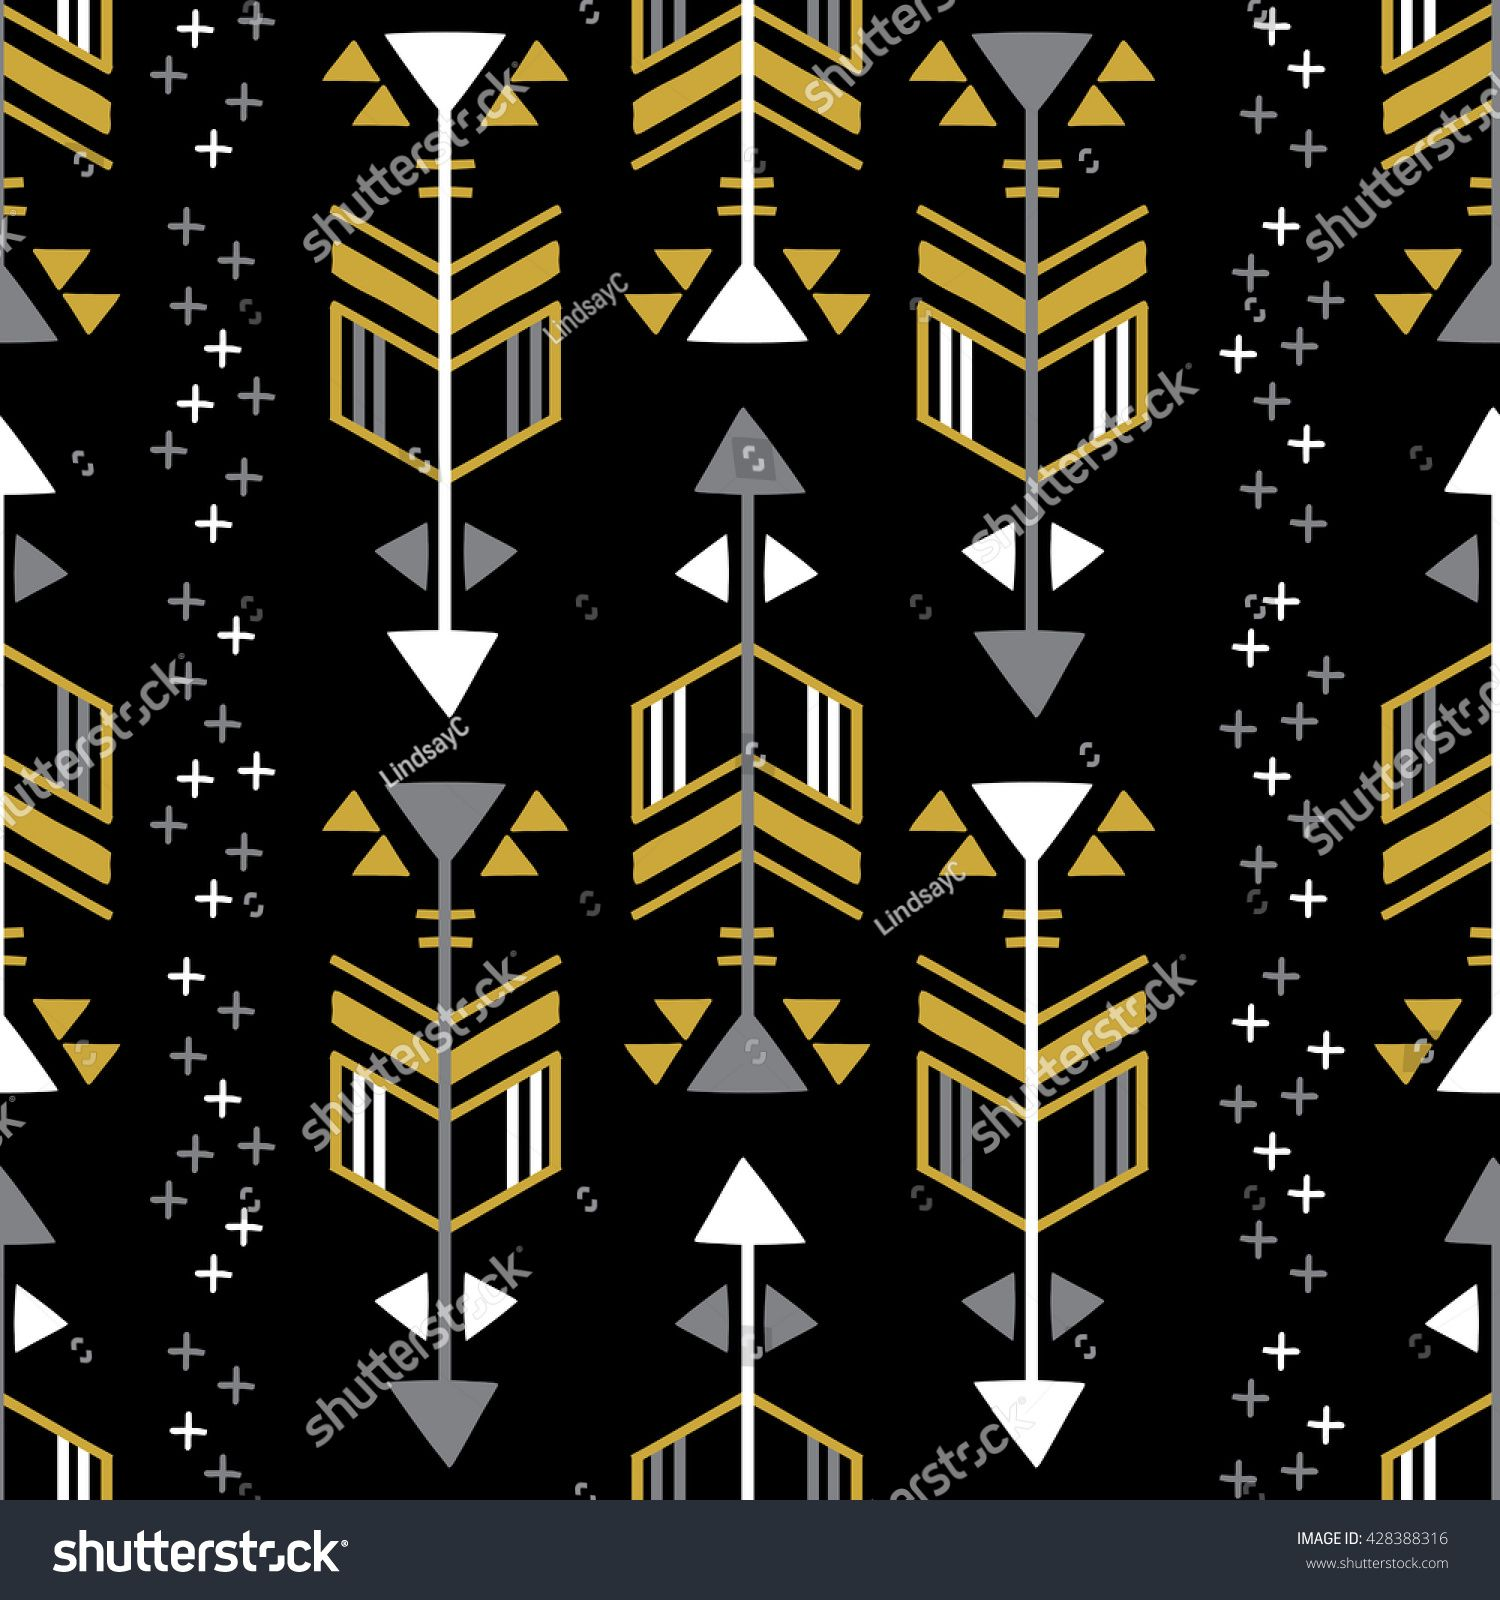 Black and Gold Geometric Arrow Seamless Repeat Wallpaper